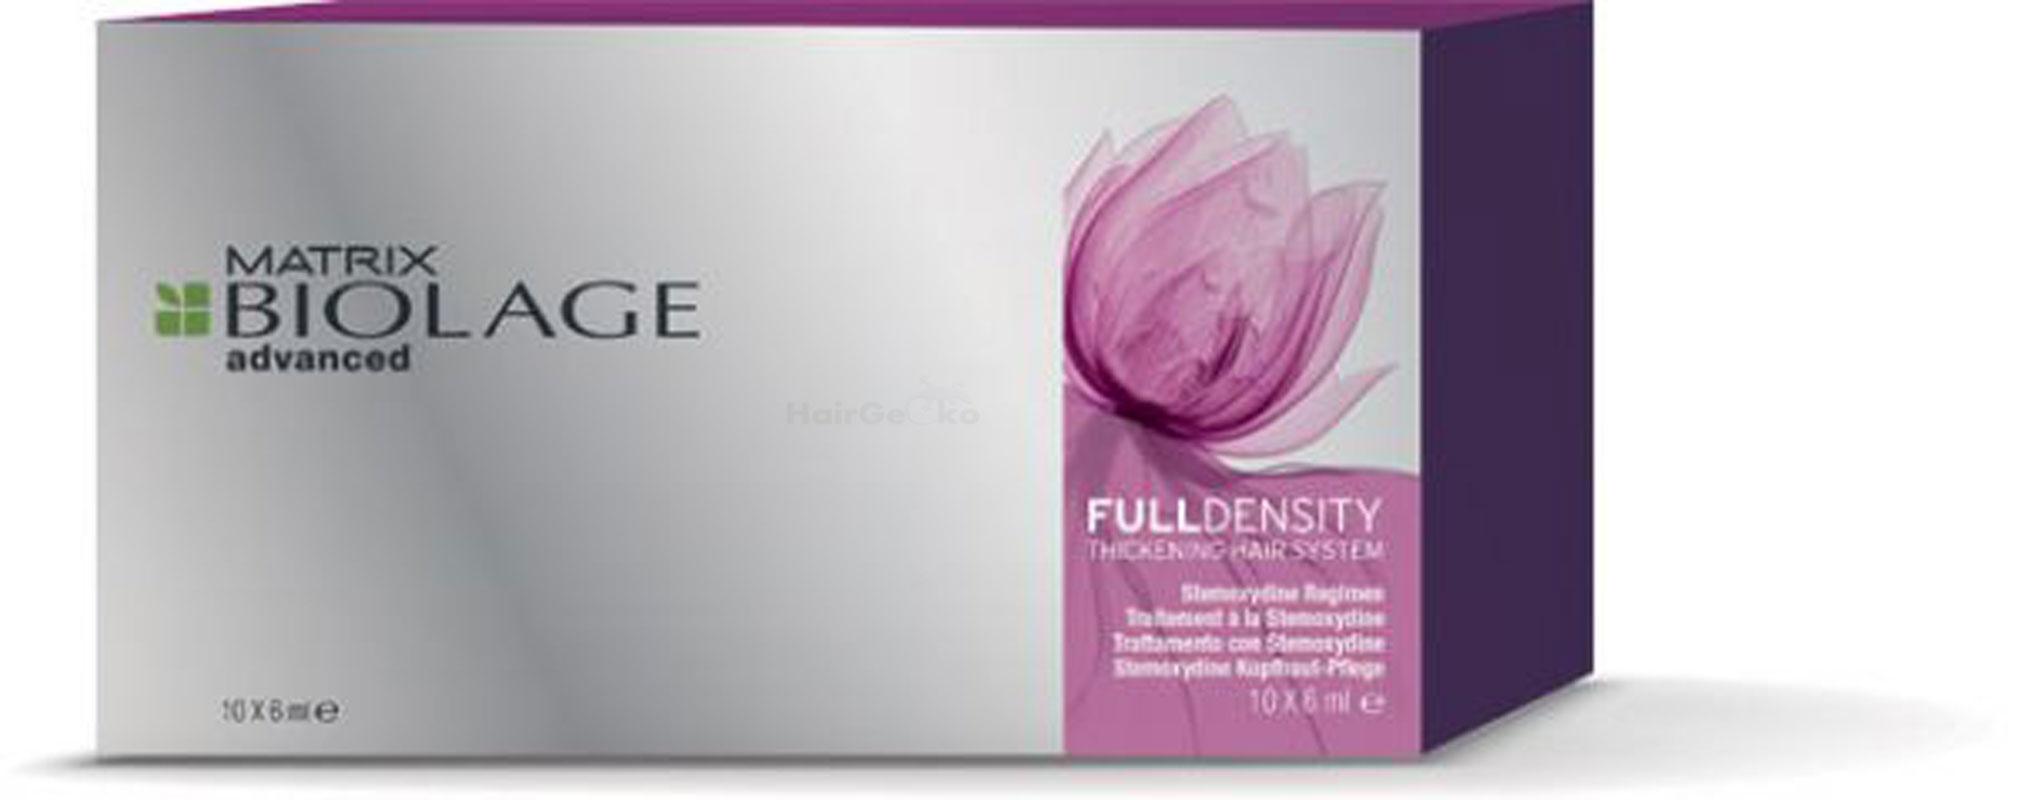 Matrix Biolage FullDensity Stemoxydine Kopfhaut-Pflege 10x6ml